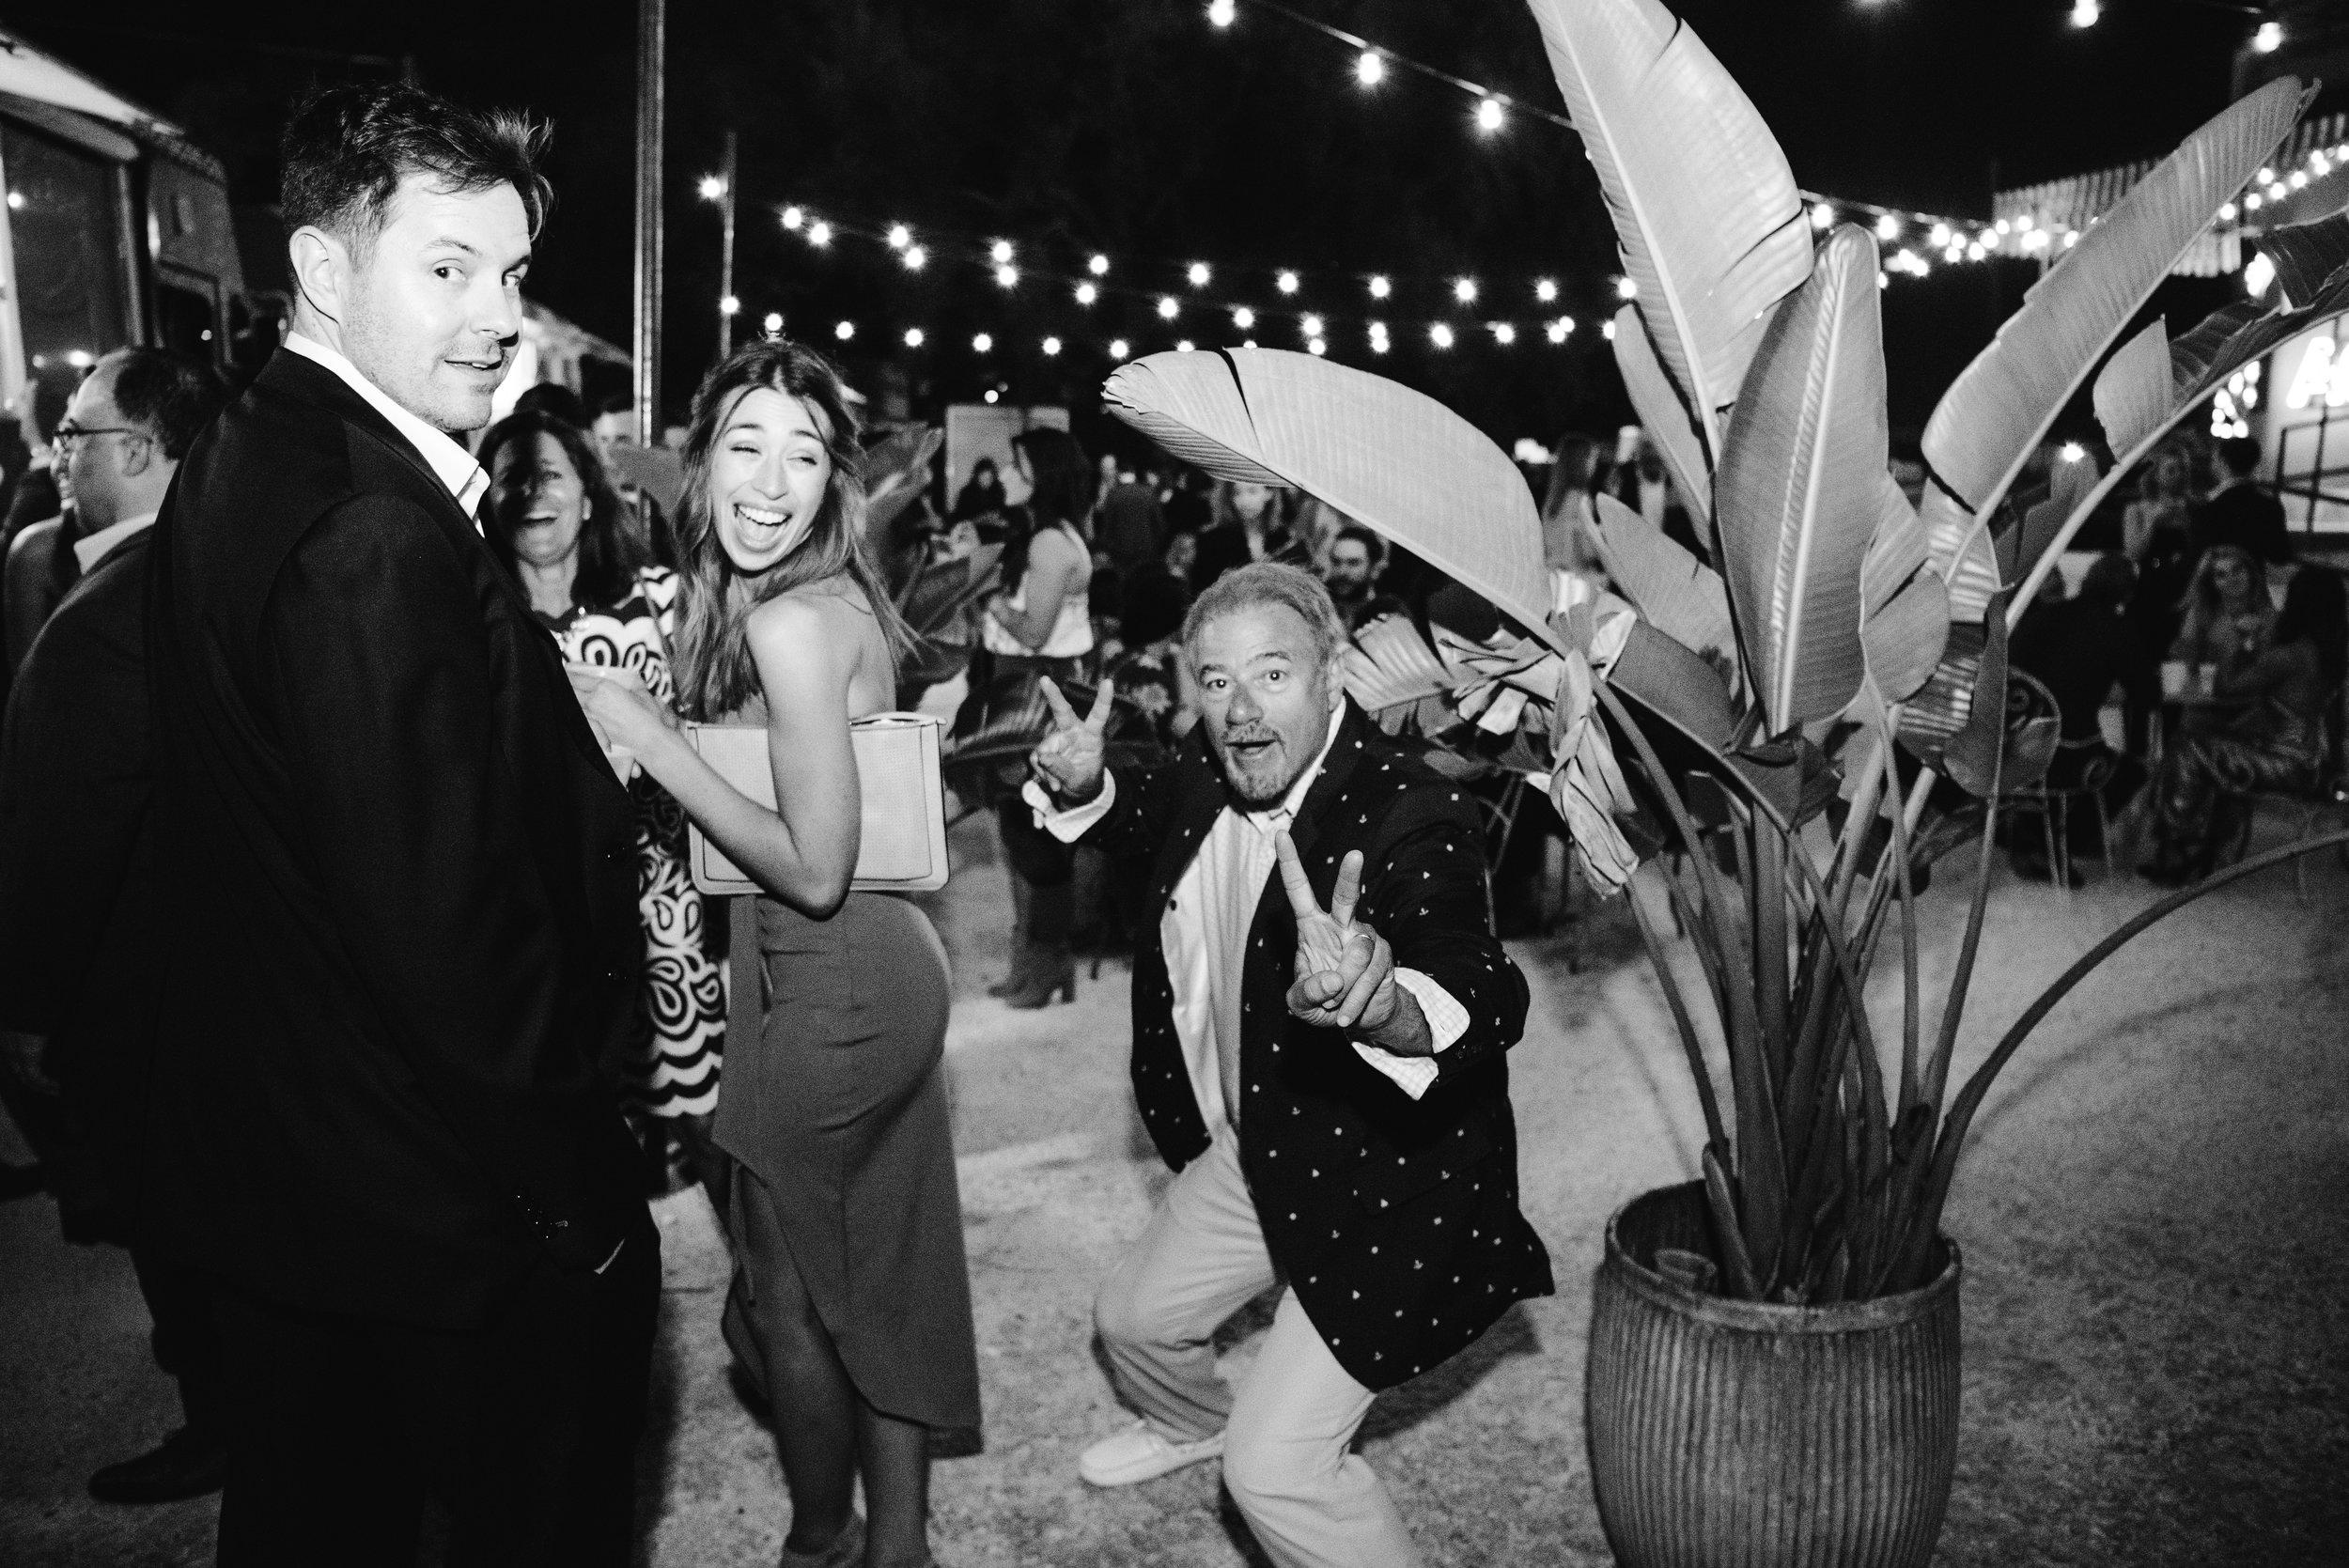 stephanie-bobby-ace-prop-house-miami-florida-wedding-1204.jpg